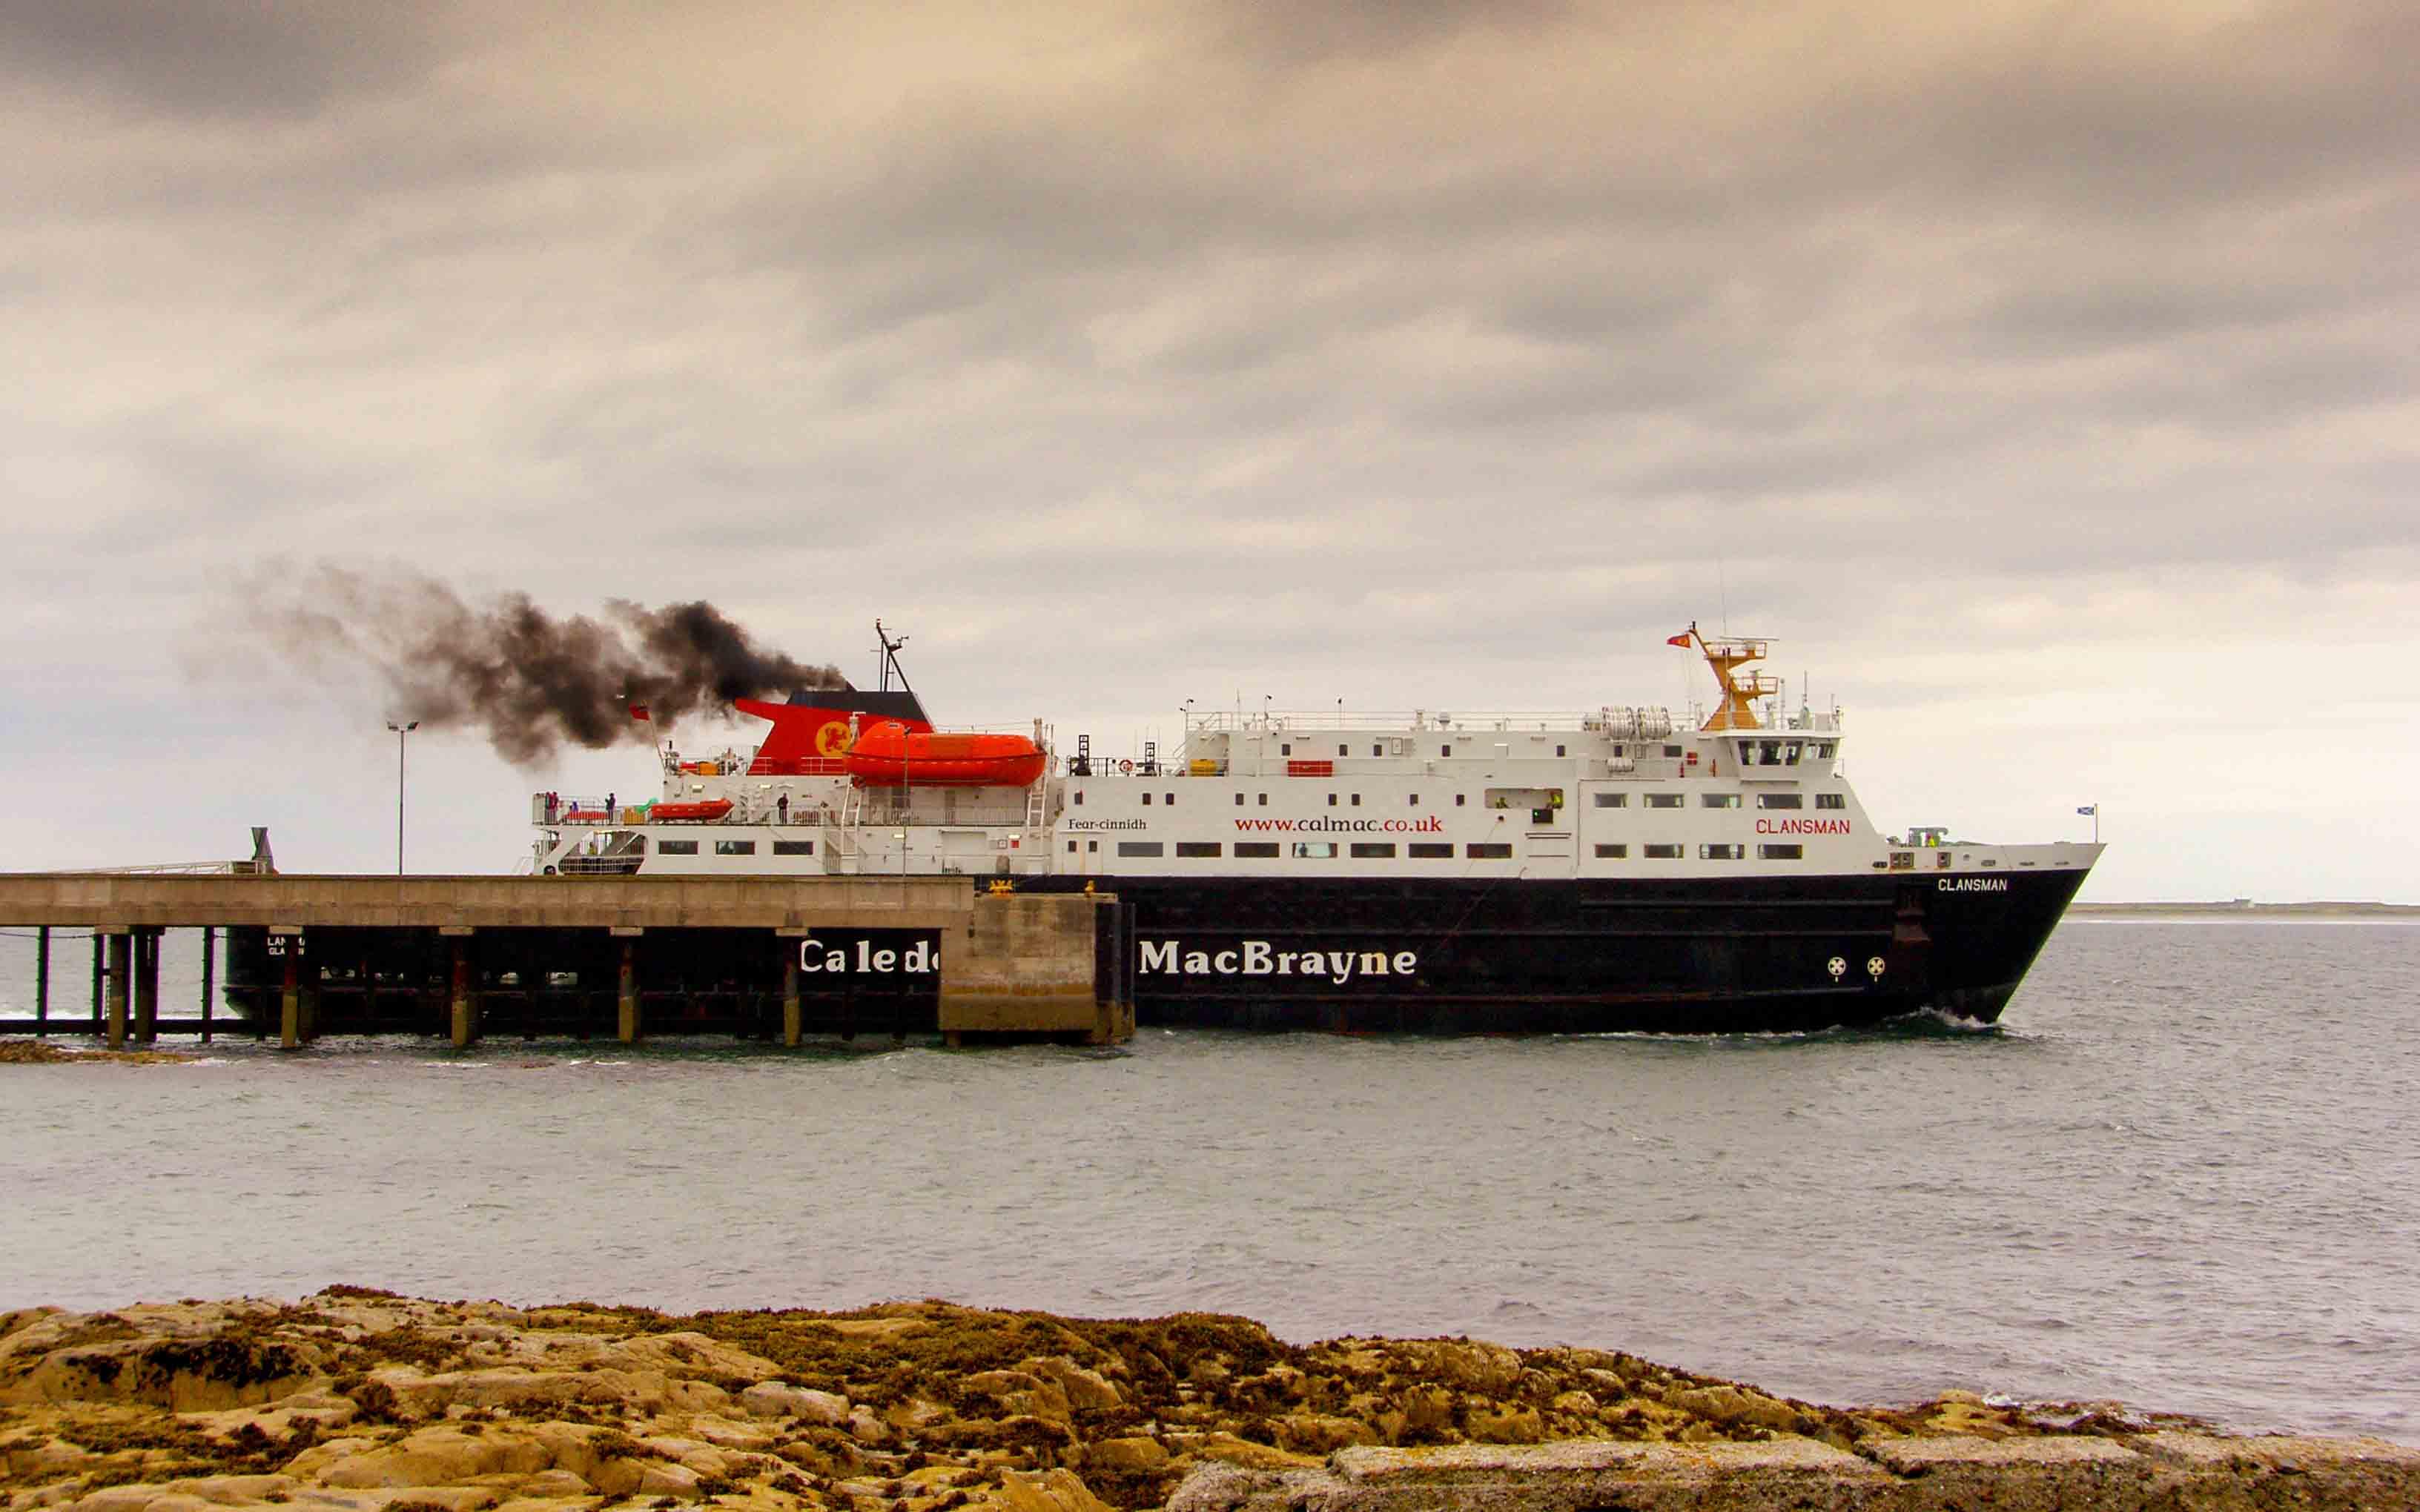 Clansman leaving Tiree for Barra (Ships of CalMac)